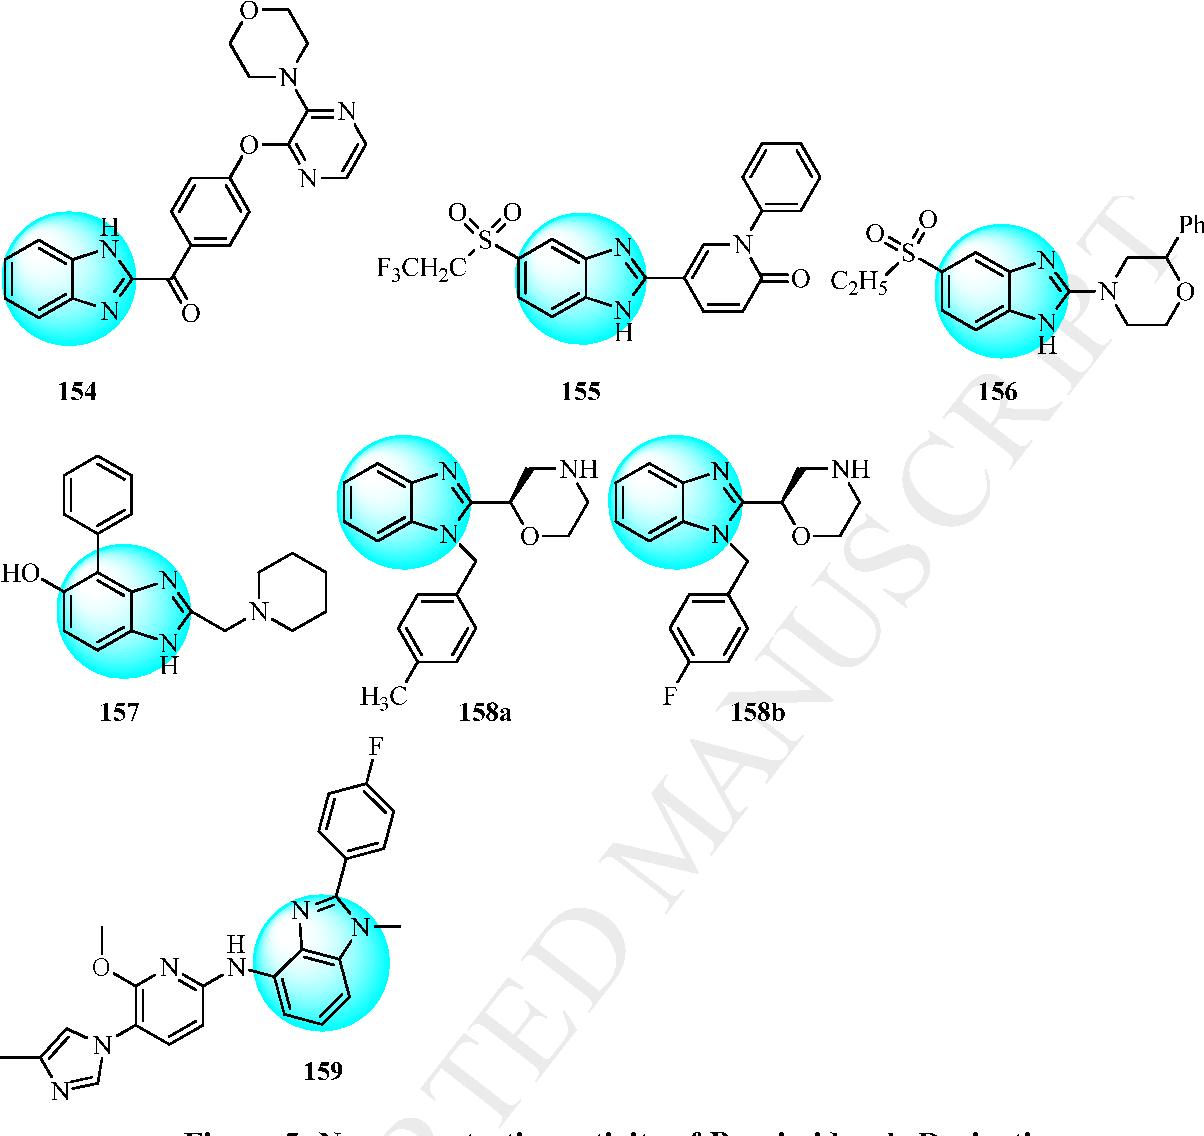 Figure 5: Neuro-protective activity of Benzimidazole Derivatives